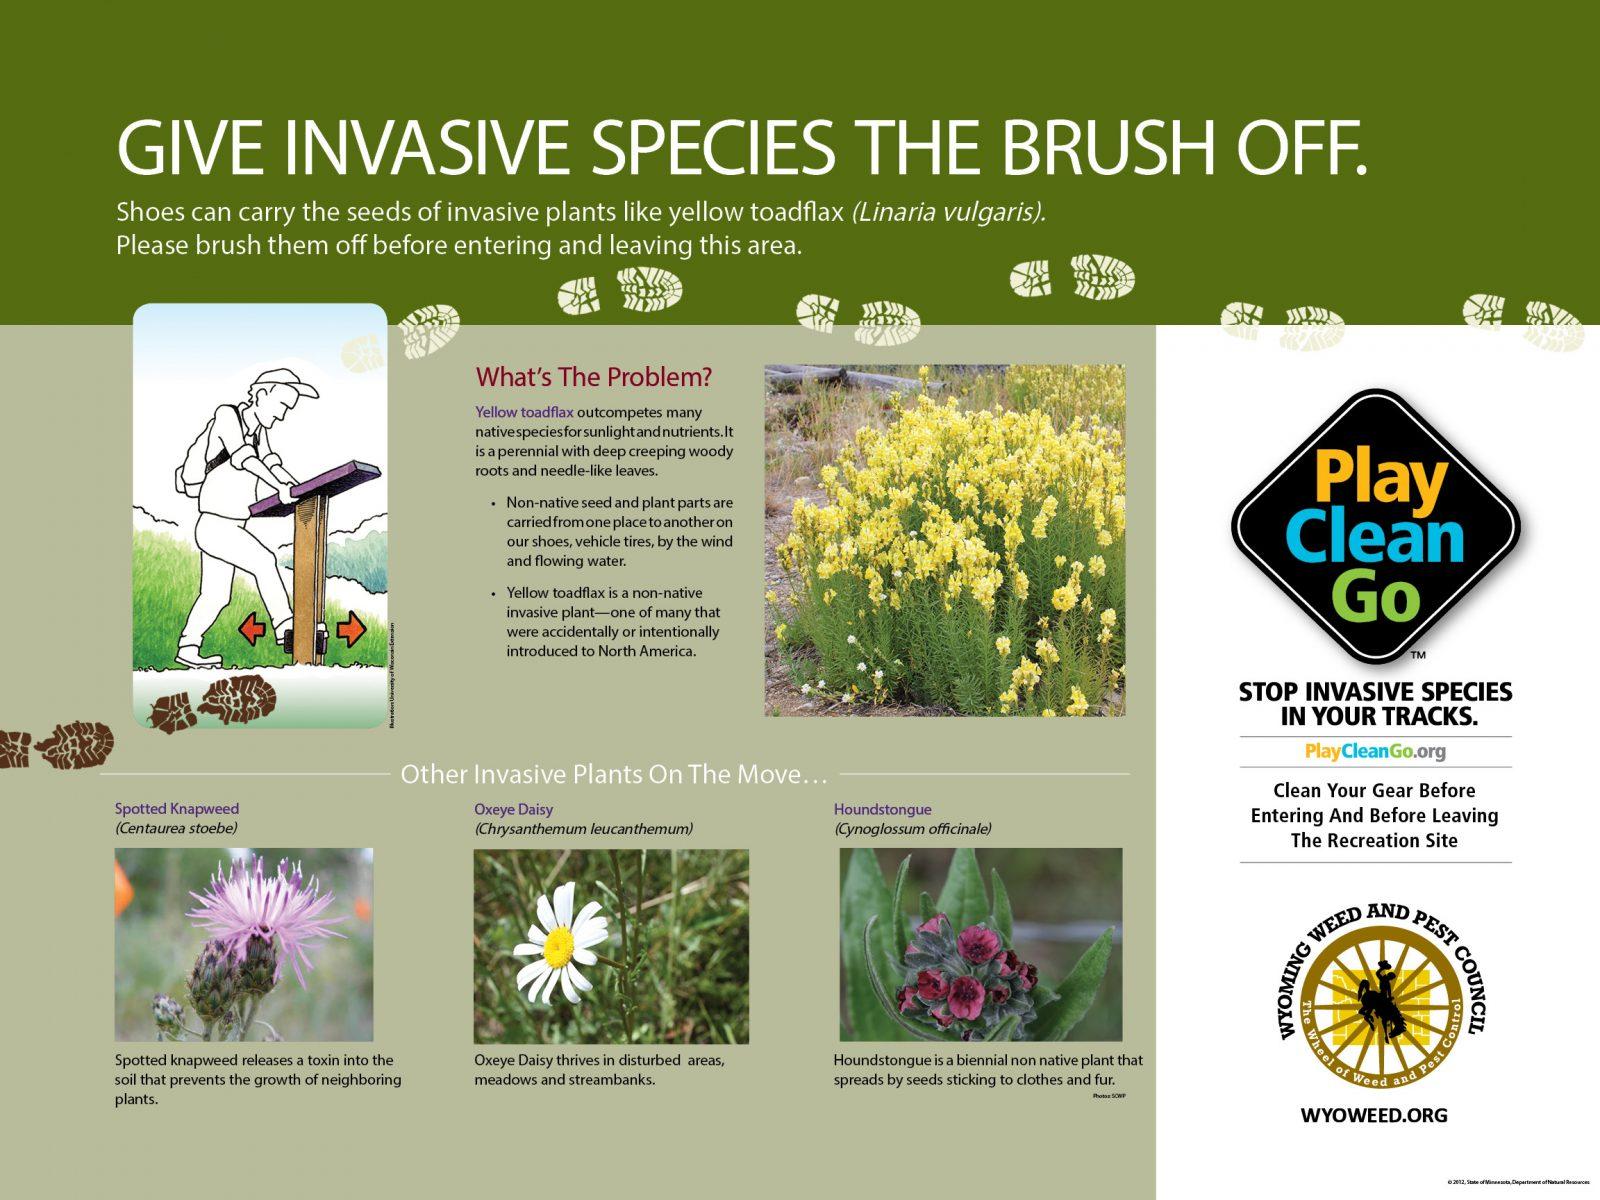 PlayCleanGo Boot Brush Trail Poster: Hiker